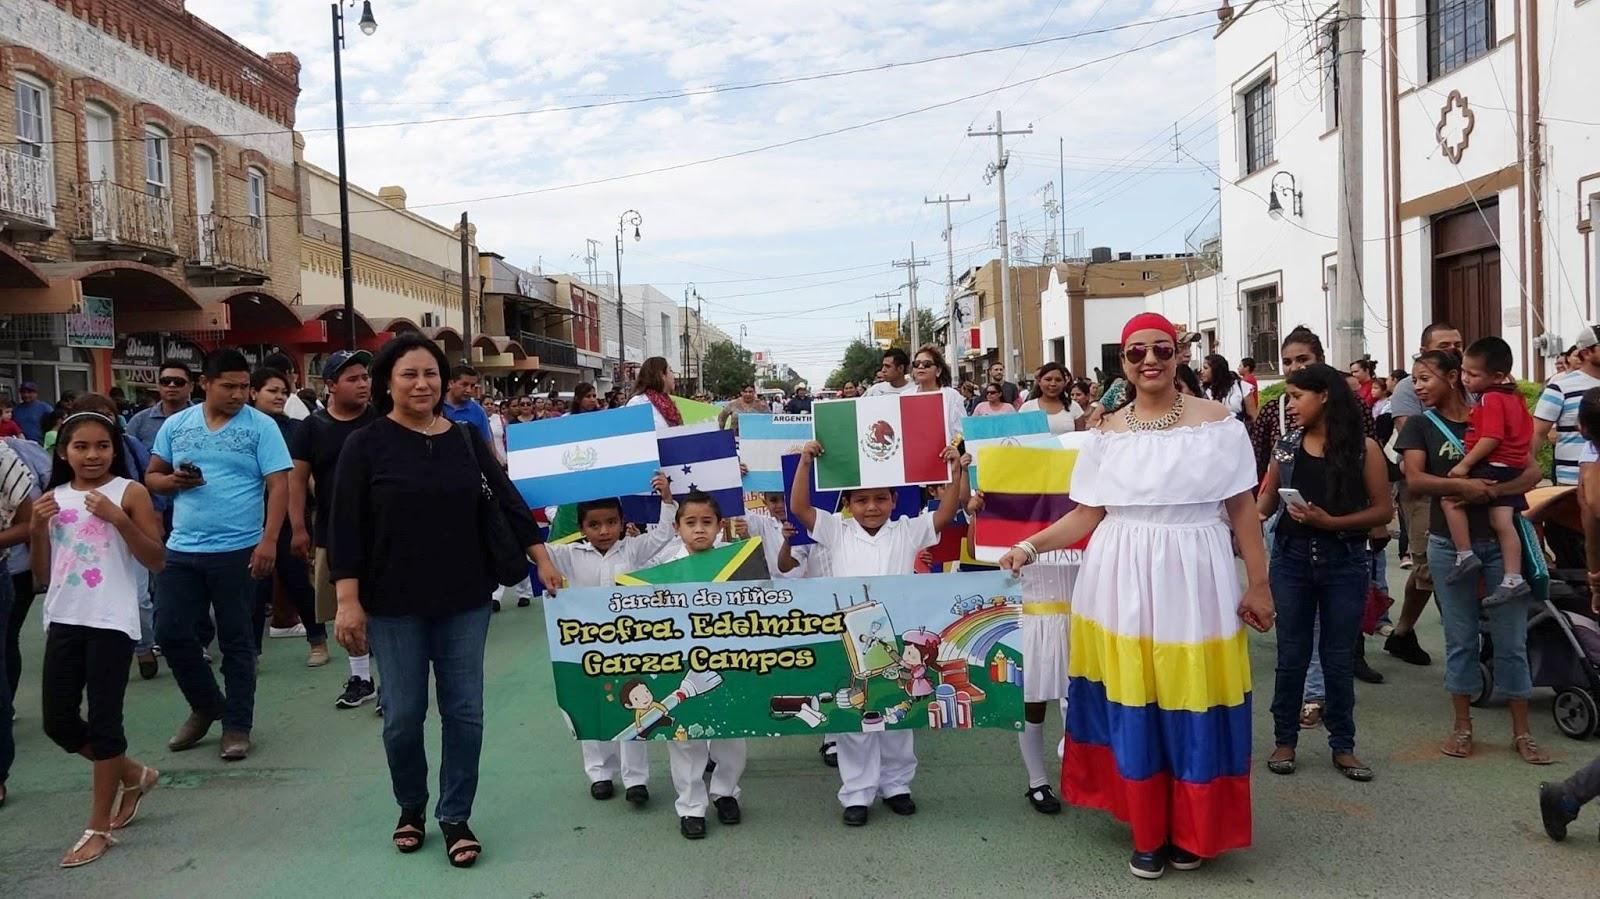 Desfile glbt por las calles de centro historico - 2 7